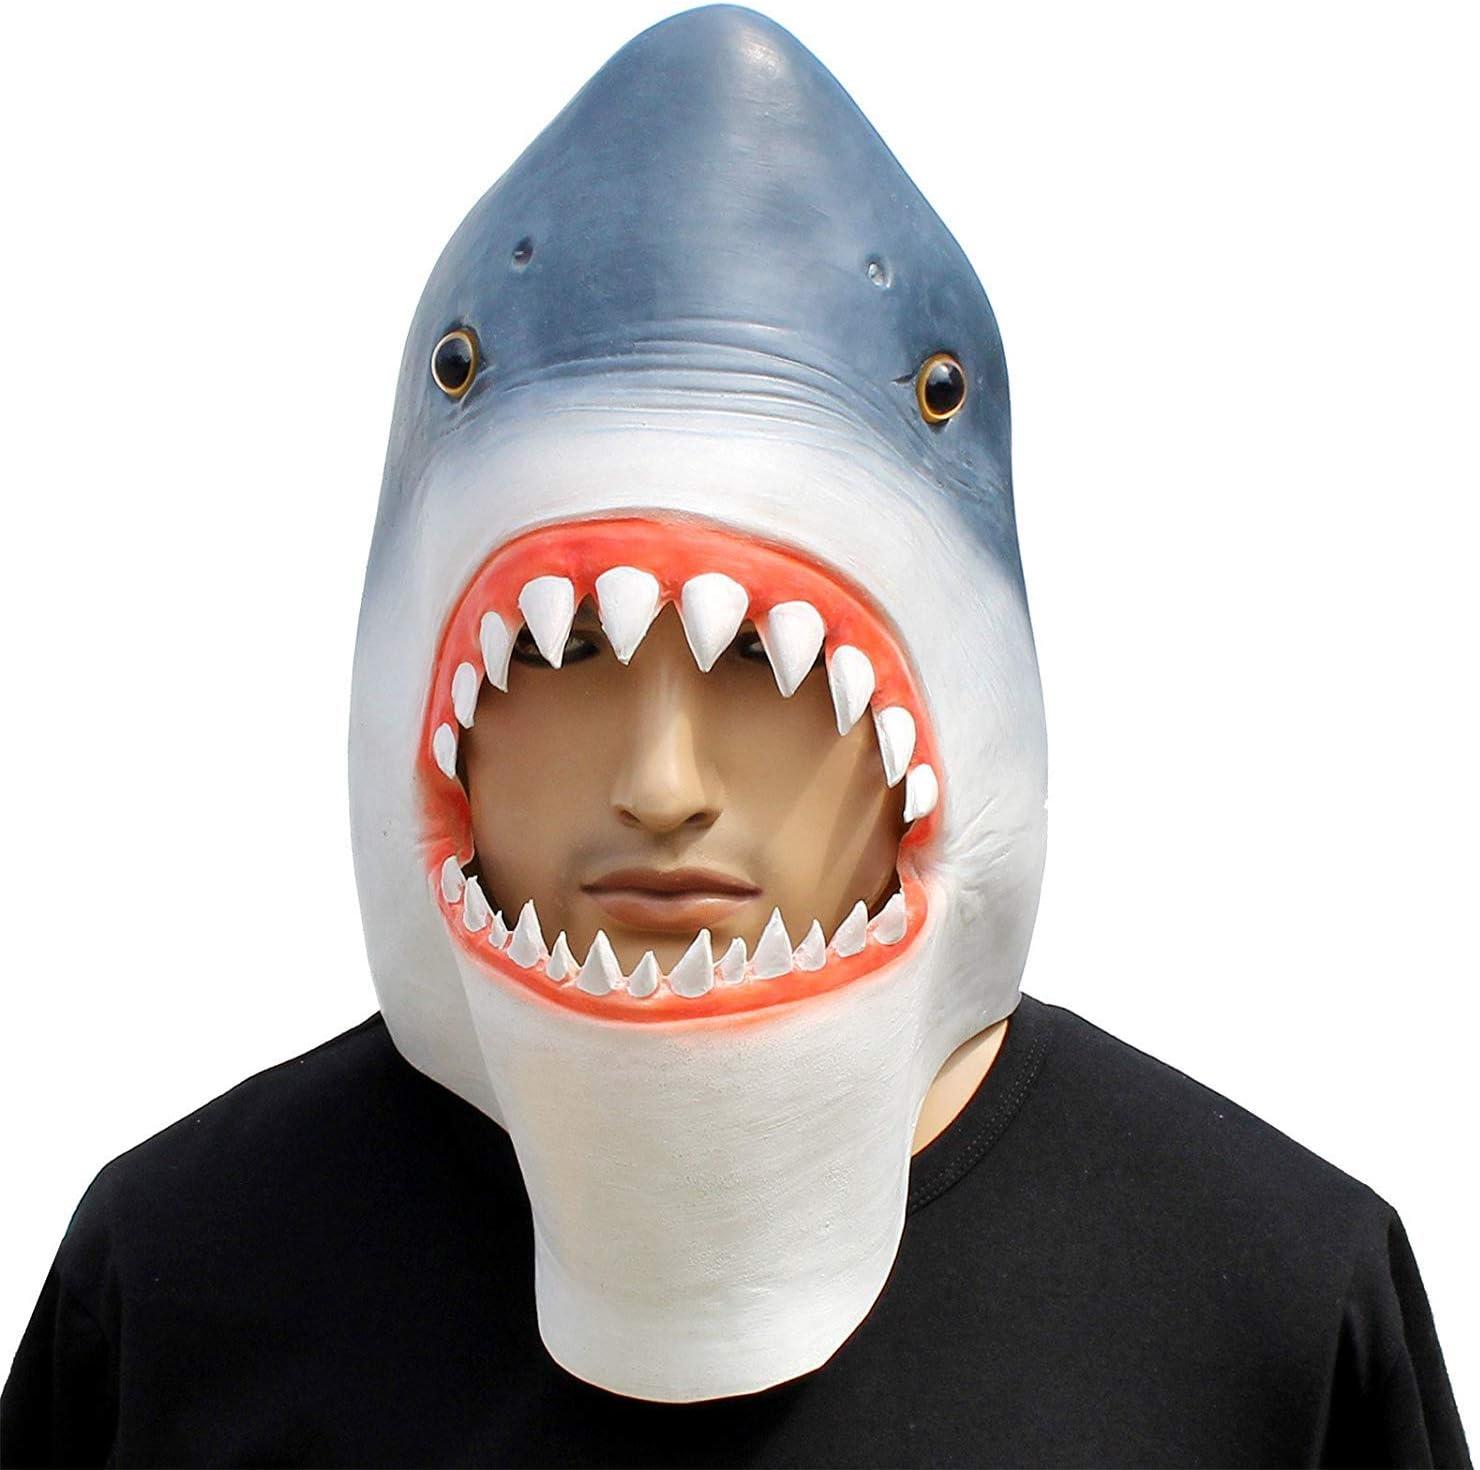 ADULT HALLOWEEN ANIMALS /& NATURE SHARK MASK FANCY DRESS ACCESSORY